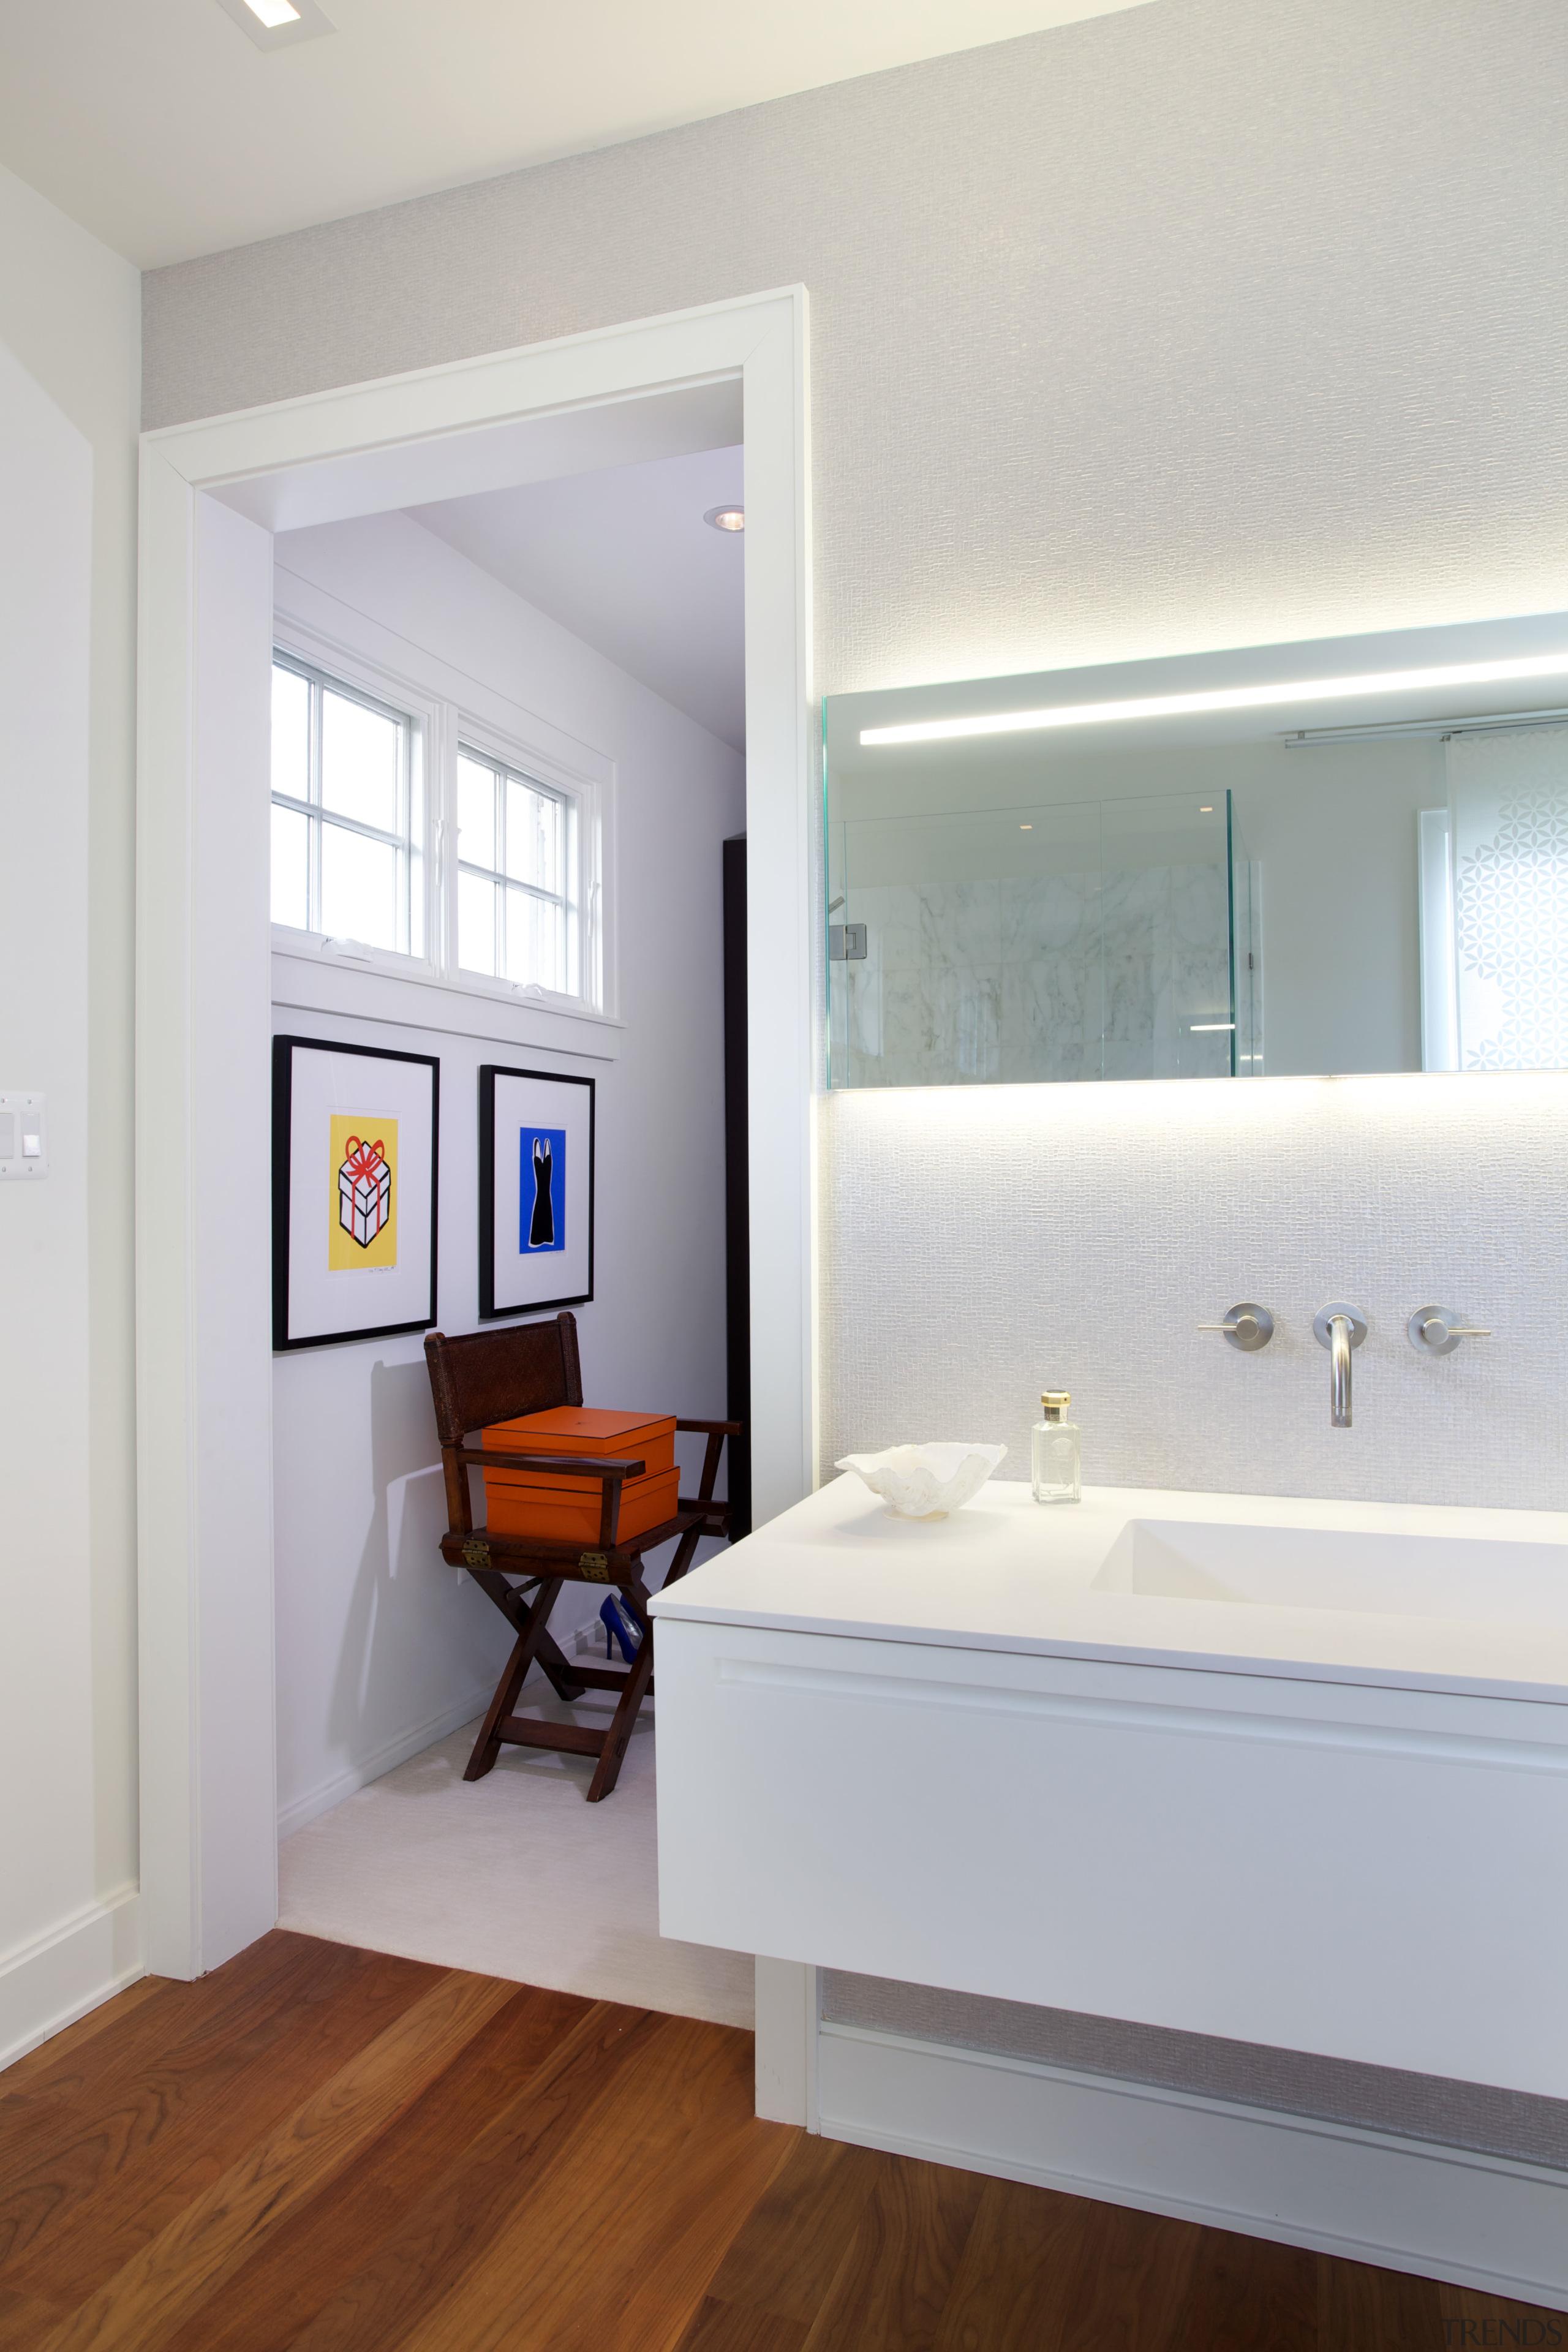 This master bathroom, designed by Nestor Santa-Cruz, continues architecture, bathroom, ceiling, daylighting, floor, flooring, home, house, interior design, room, sink, wall, window, wood flooring, white, gray